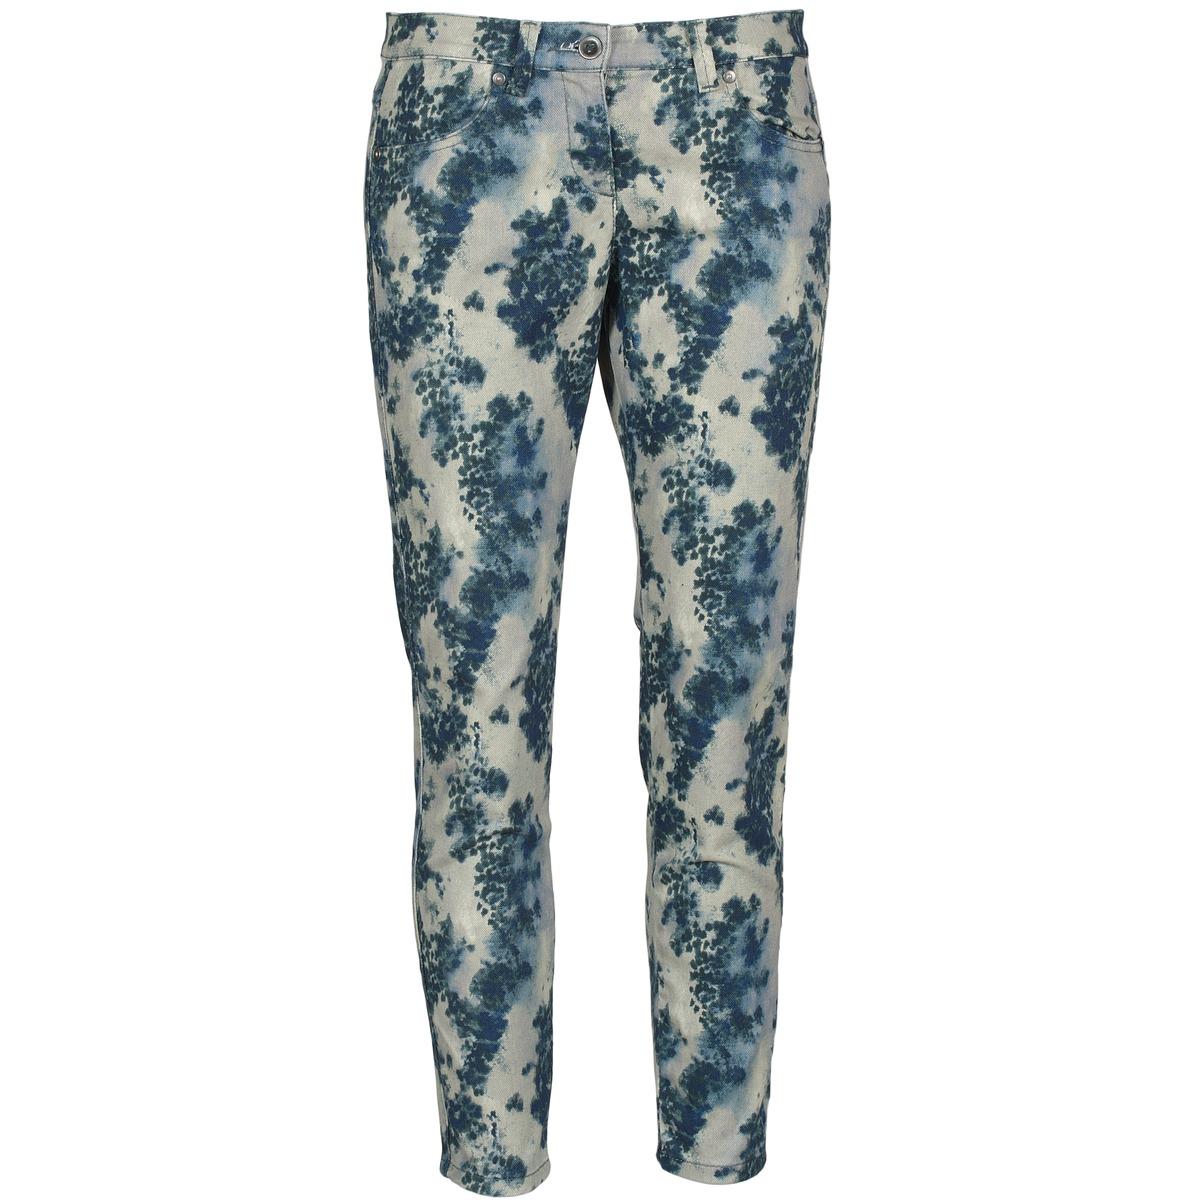 4m59x71m6 Pantalon Pantalon Sisley 4m59x71m6 Pantalon Sisley Pantalon 4m59x71m6 Sisley Sisley 5ARj34L